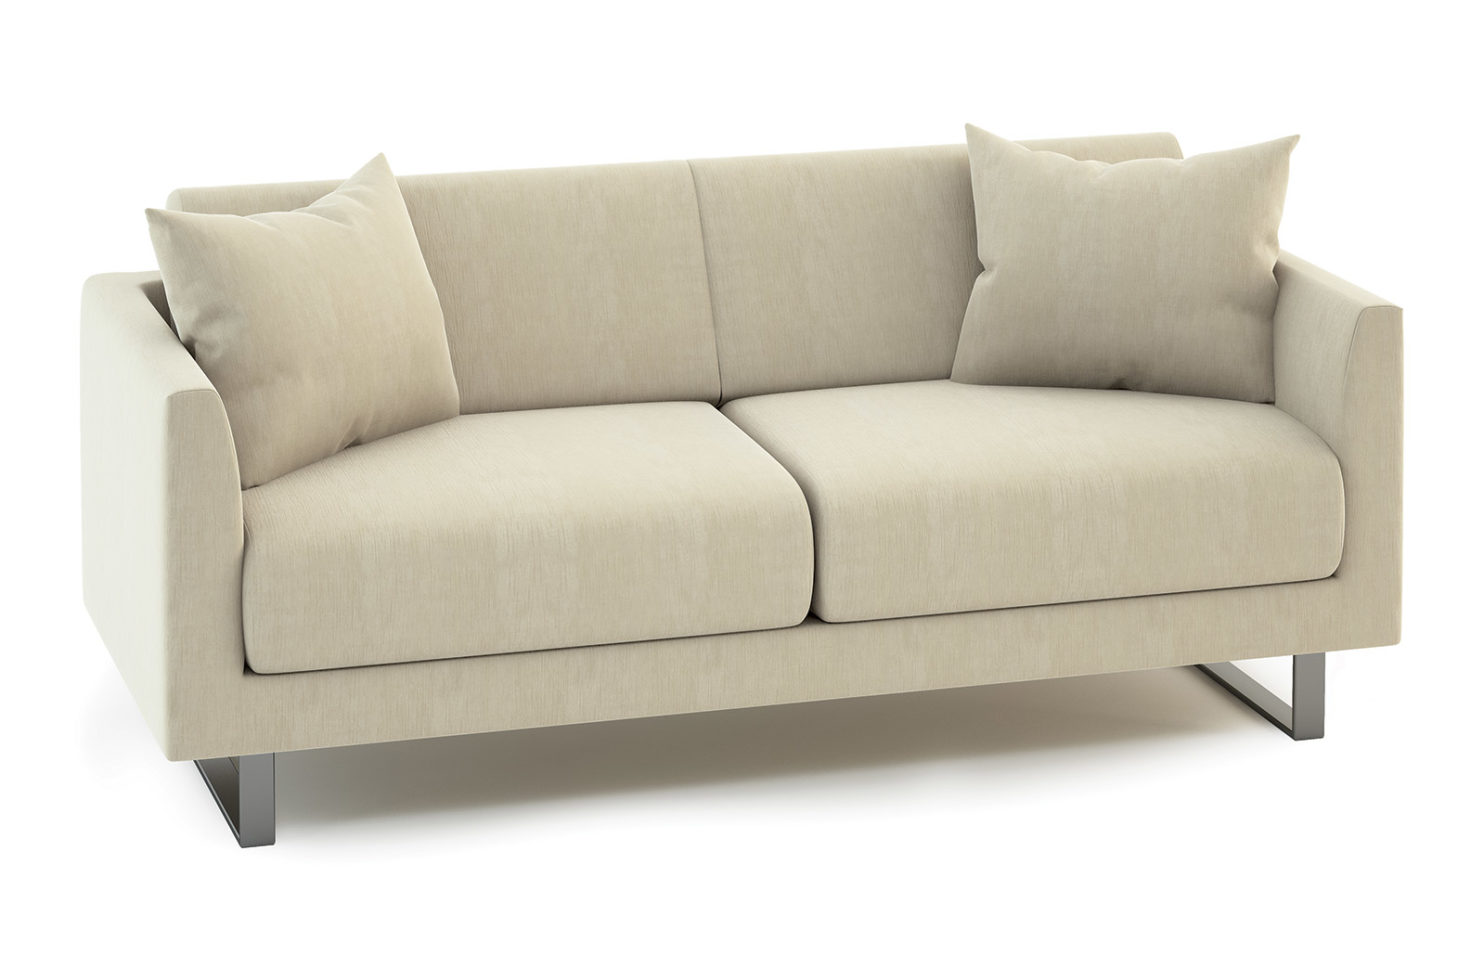 Fizz Mellini Urban Sofa 101FT006P2